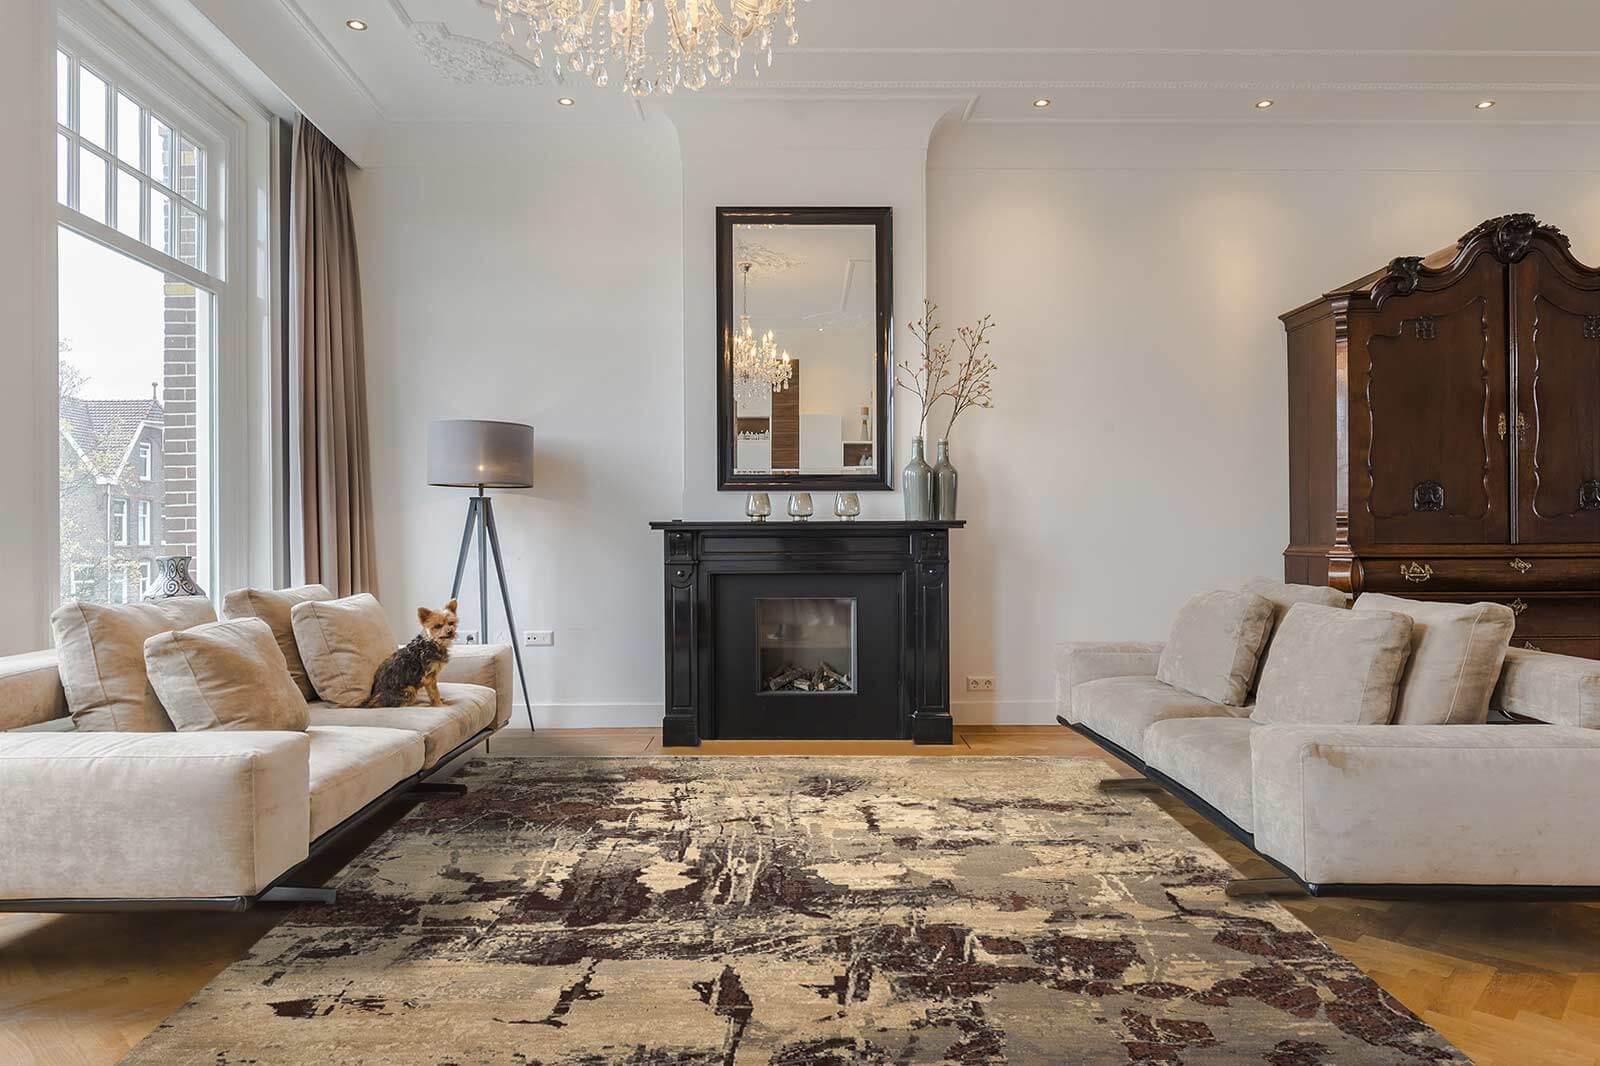 avant-garde-alchemy-tapijt-modern-design-tapijten-interieur